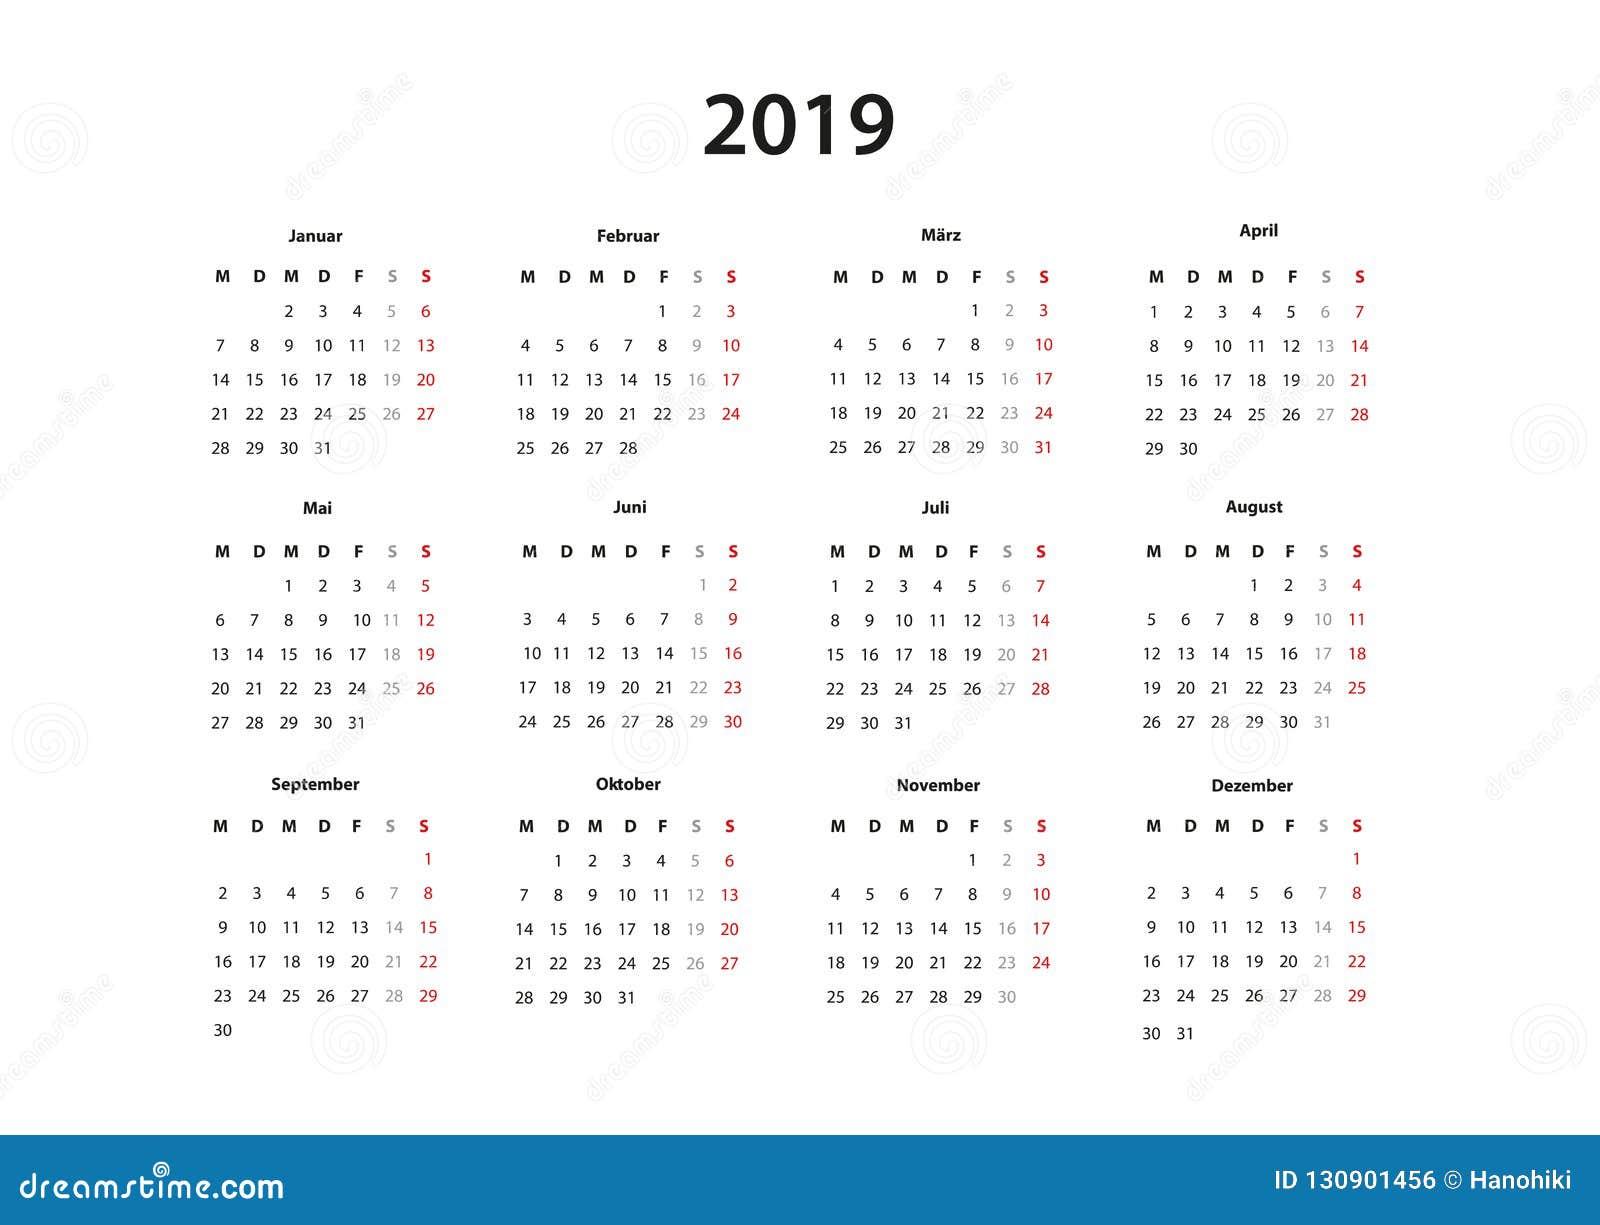 kalender 2019 2020 2021 kalender einfache vorlage deutsch stock vector illustration of. Black Bedroom Furniture Sets. Home Design Ideas